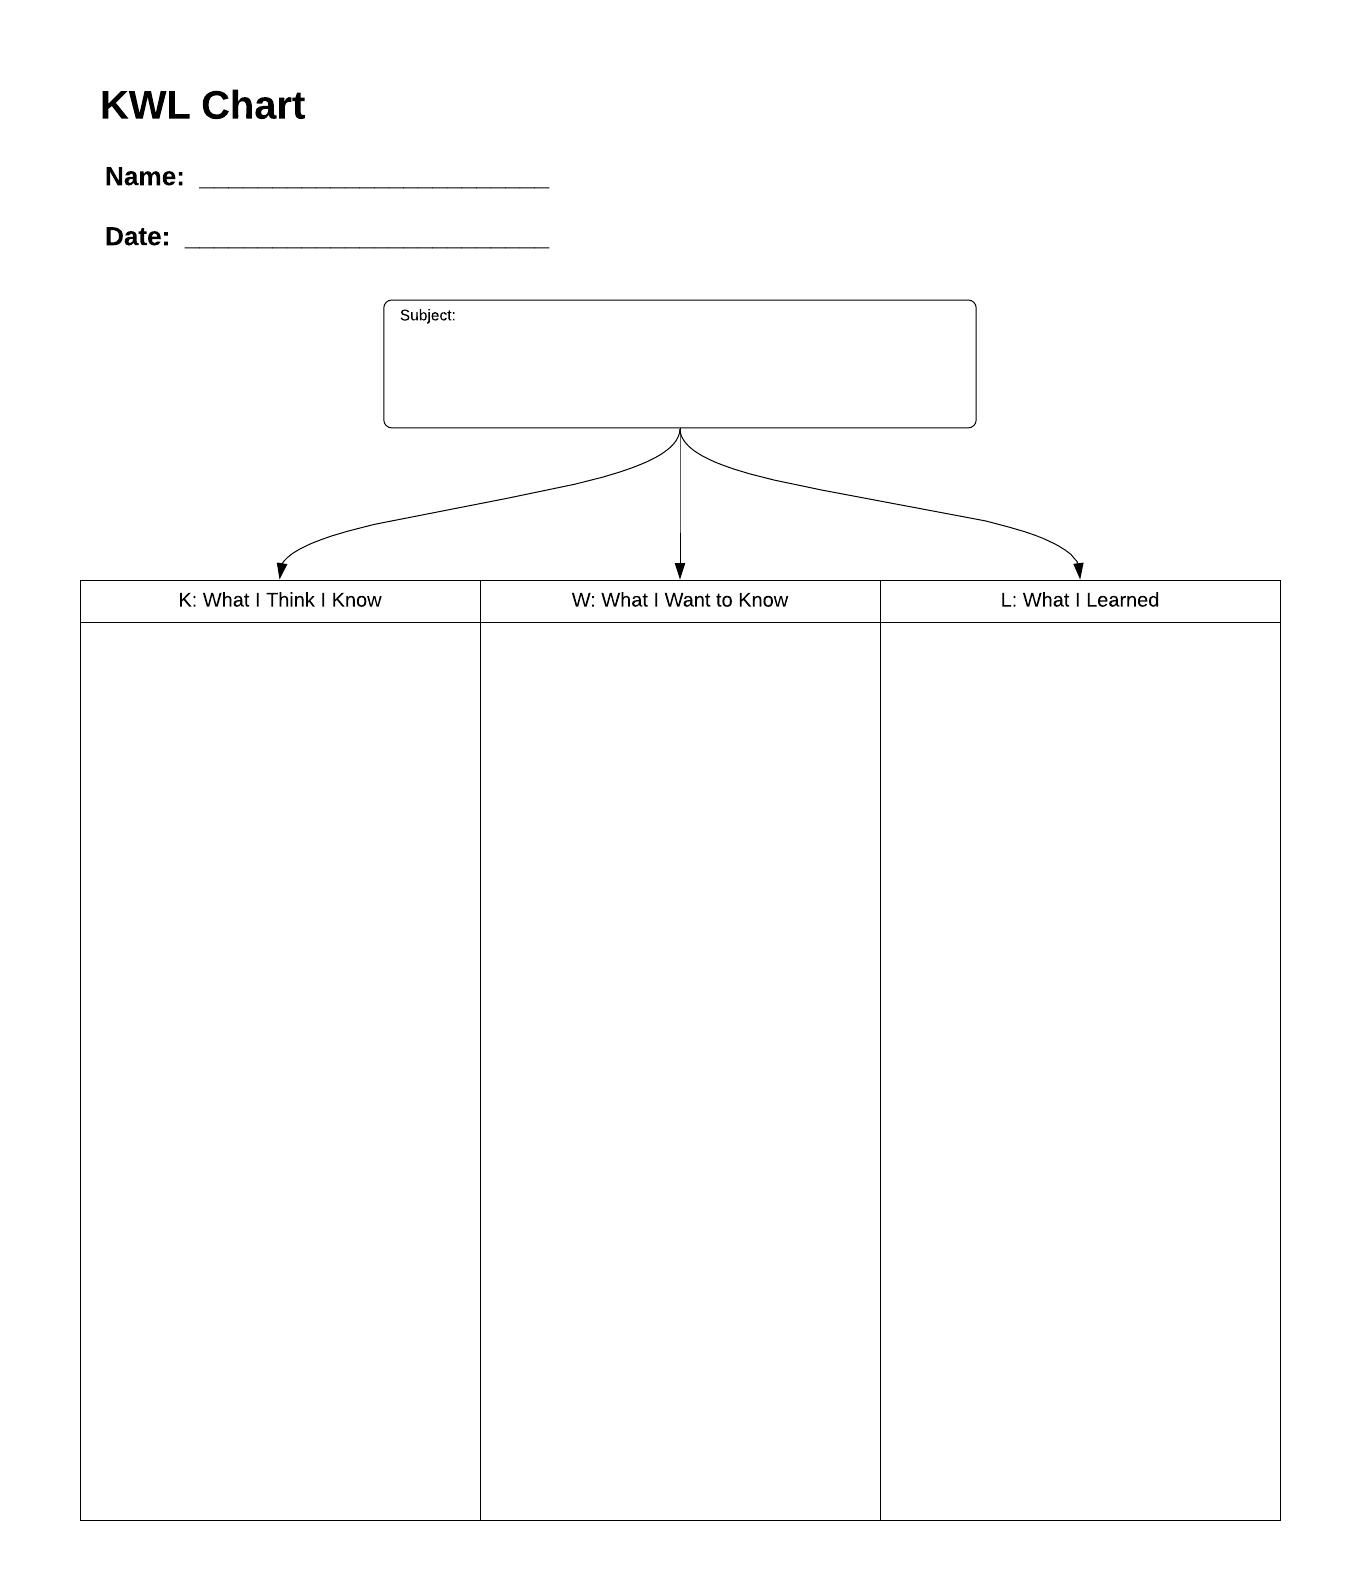 hight resolution of kwl chart printable template